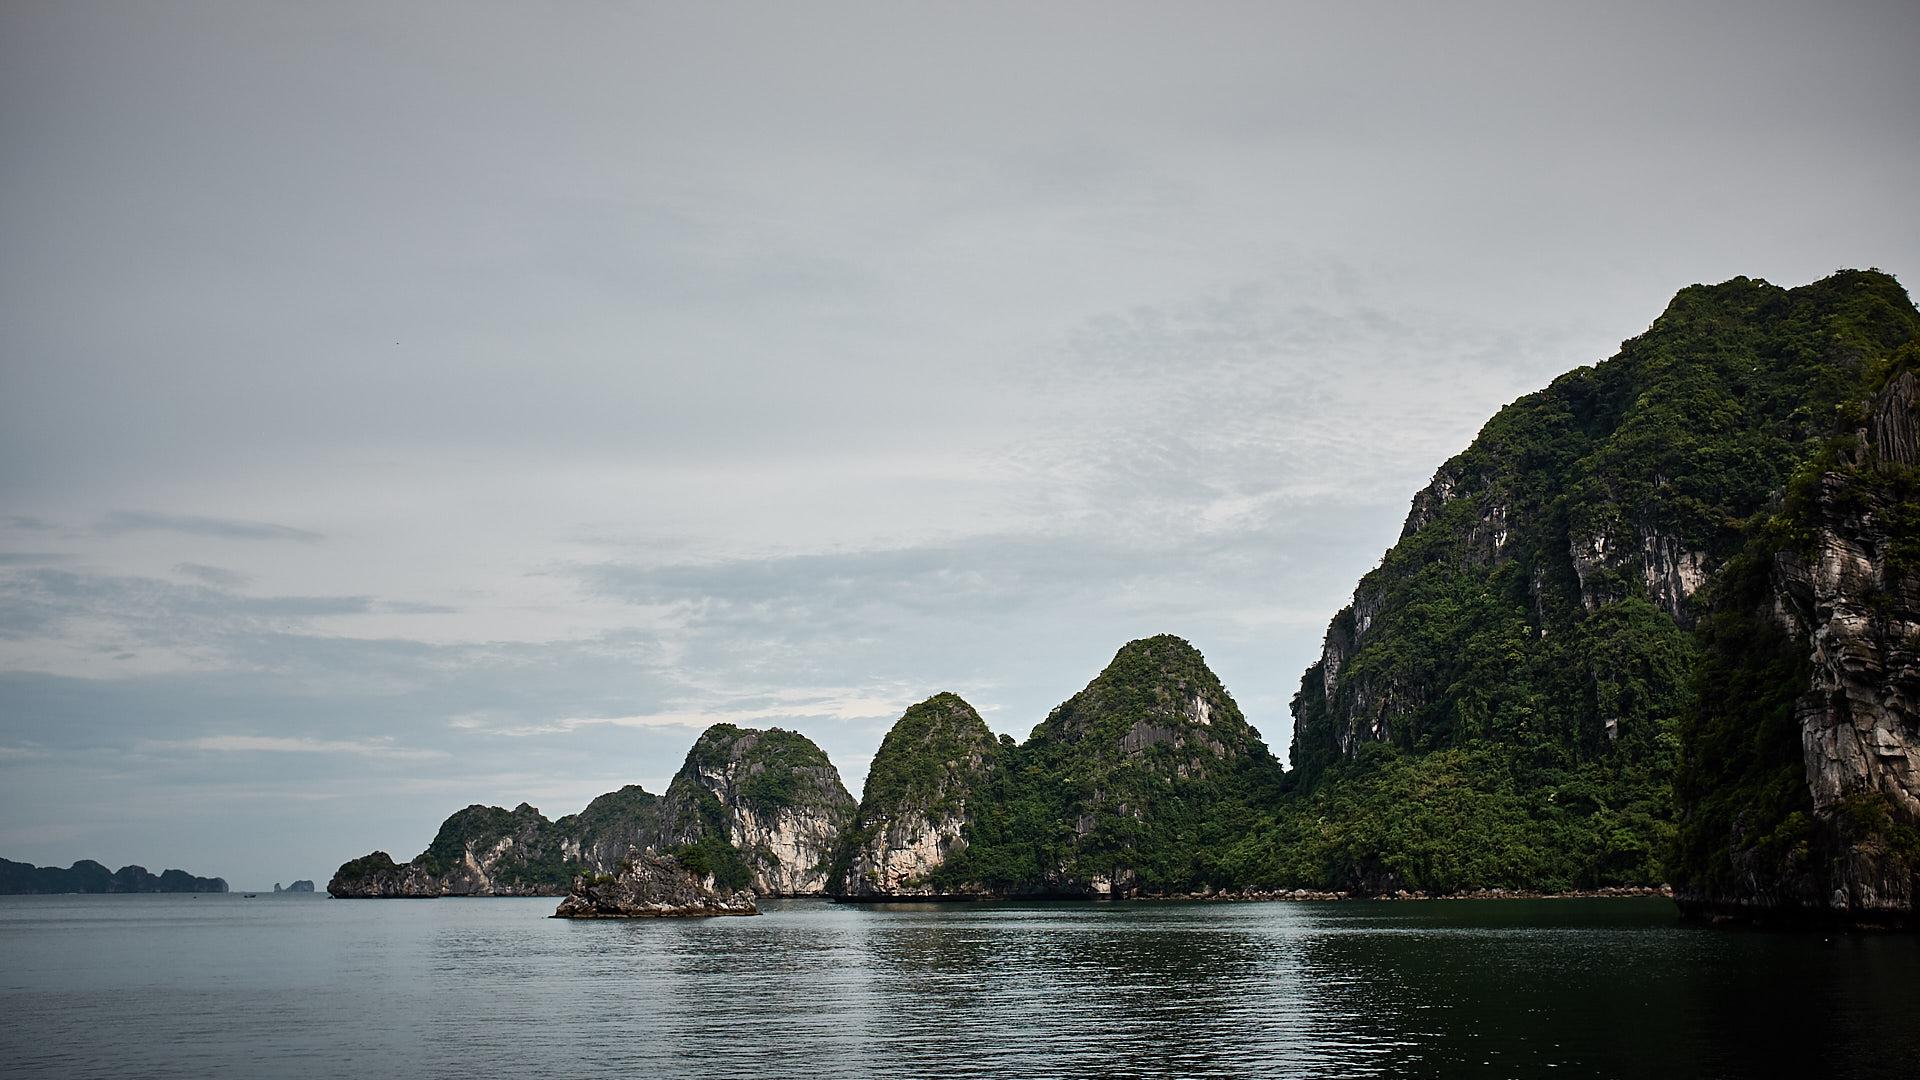 170620-Vietnam-Cat_Ba-0134.jpg